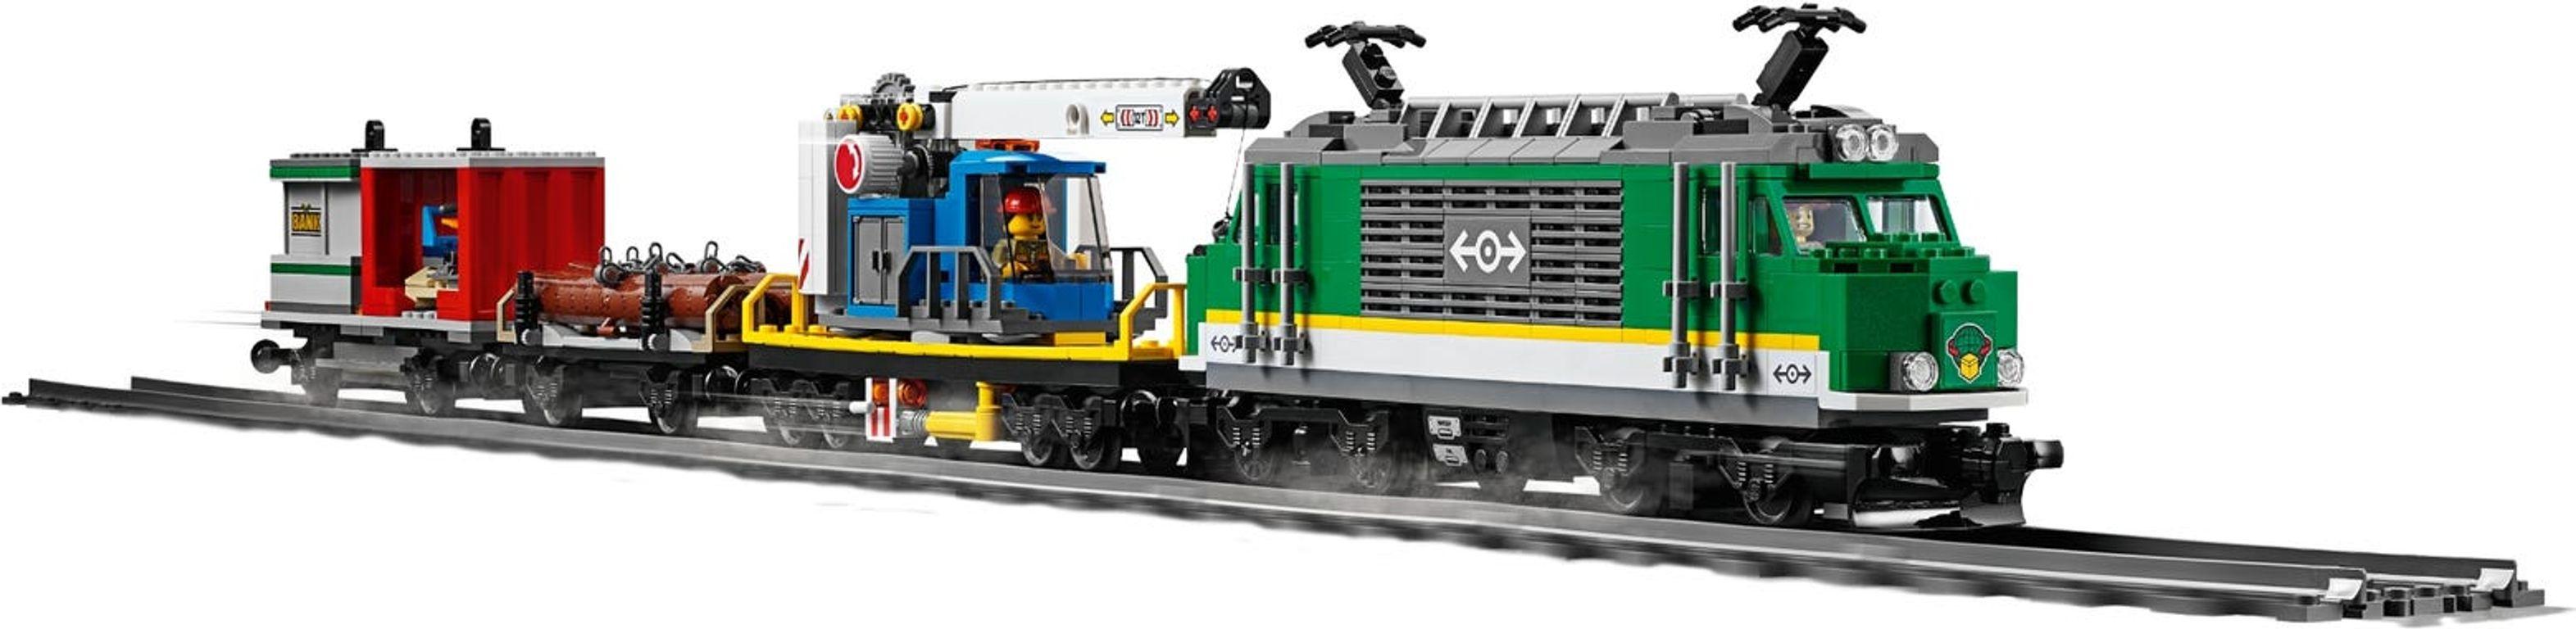 LEGO® City Cargo Train components